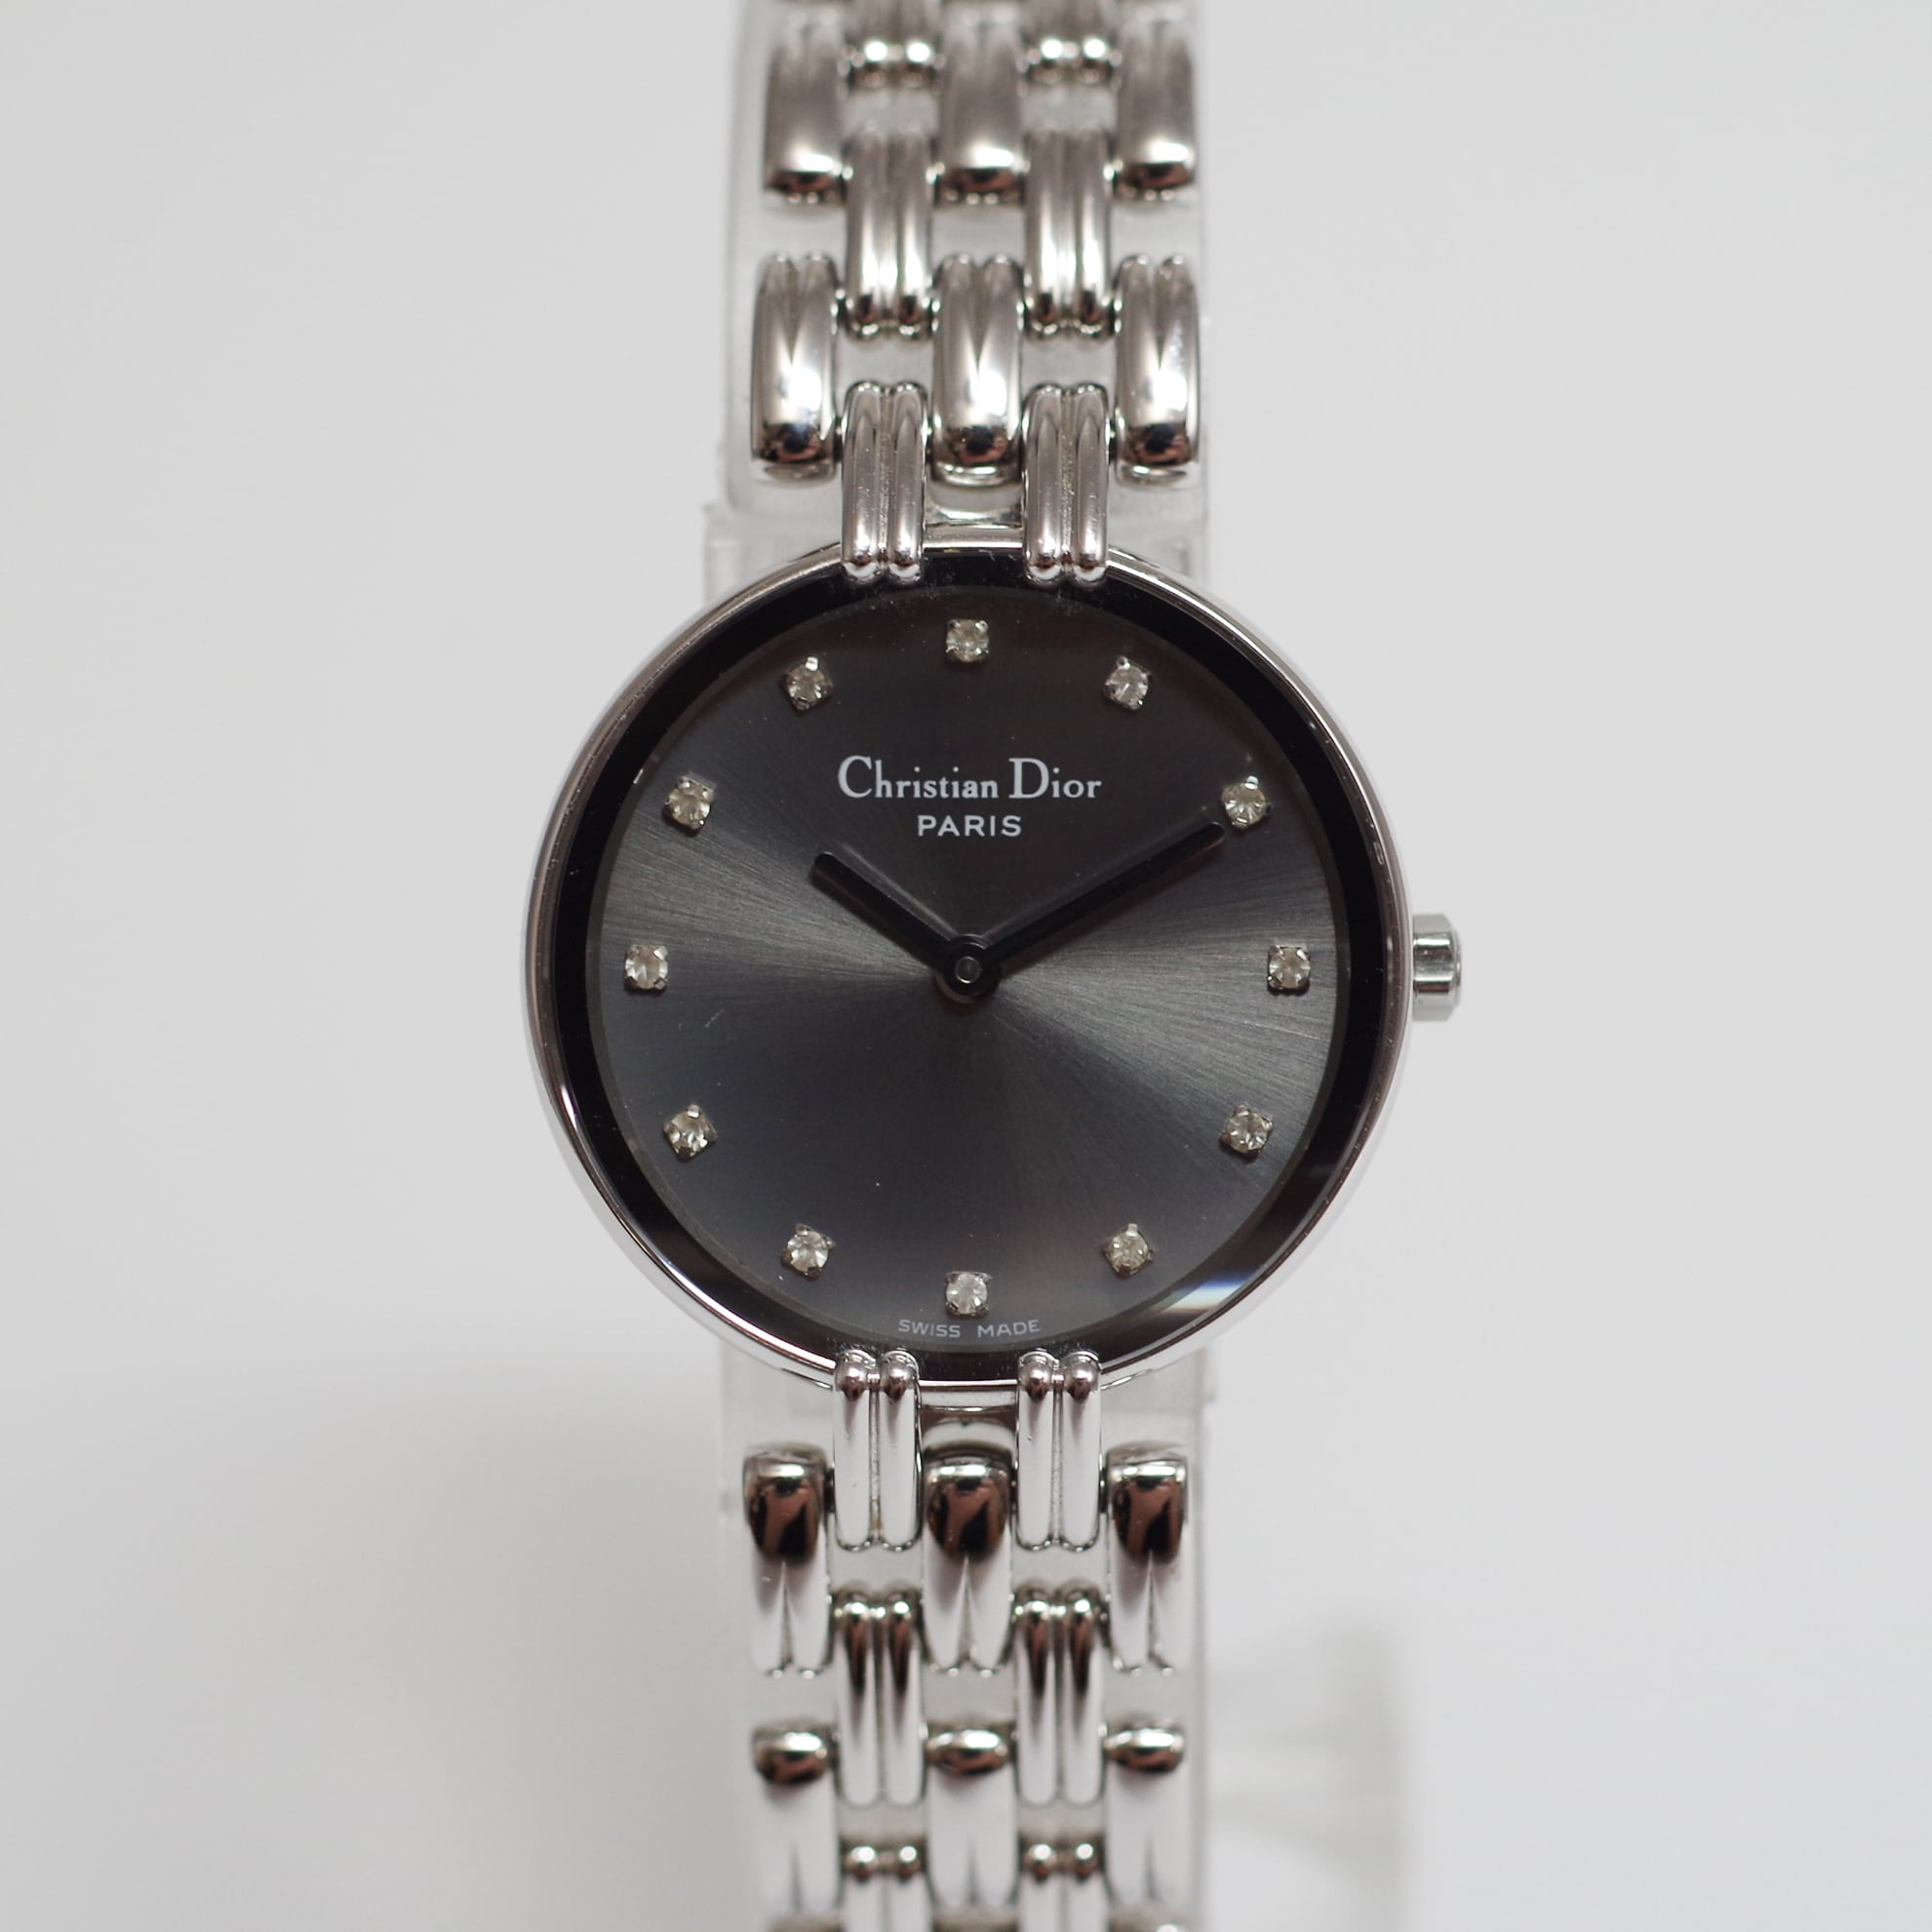 Christian Dior ディオール D44-120 バギラ SS クォーツ グレー文字盤 腕時計 レディース